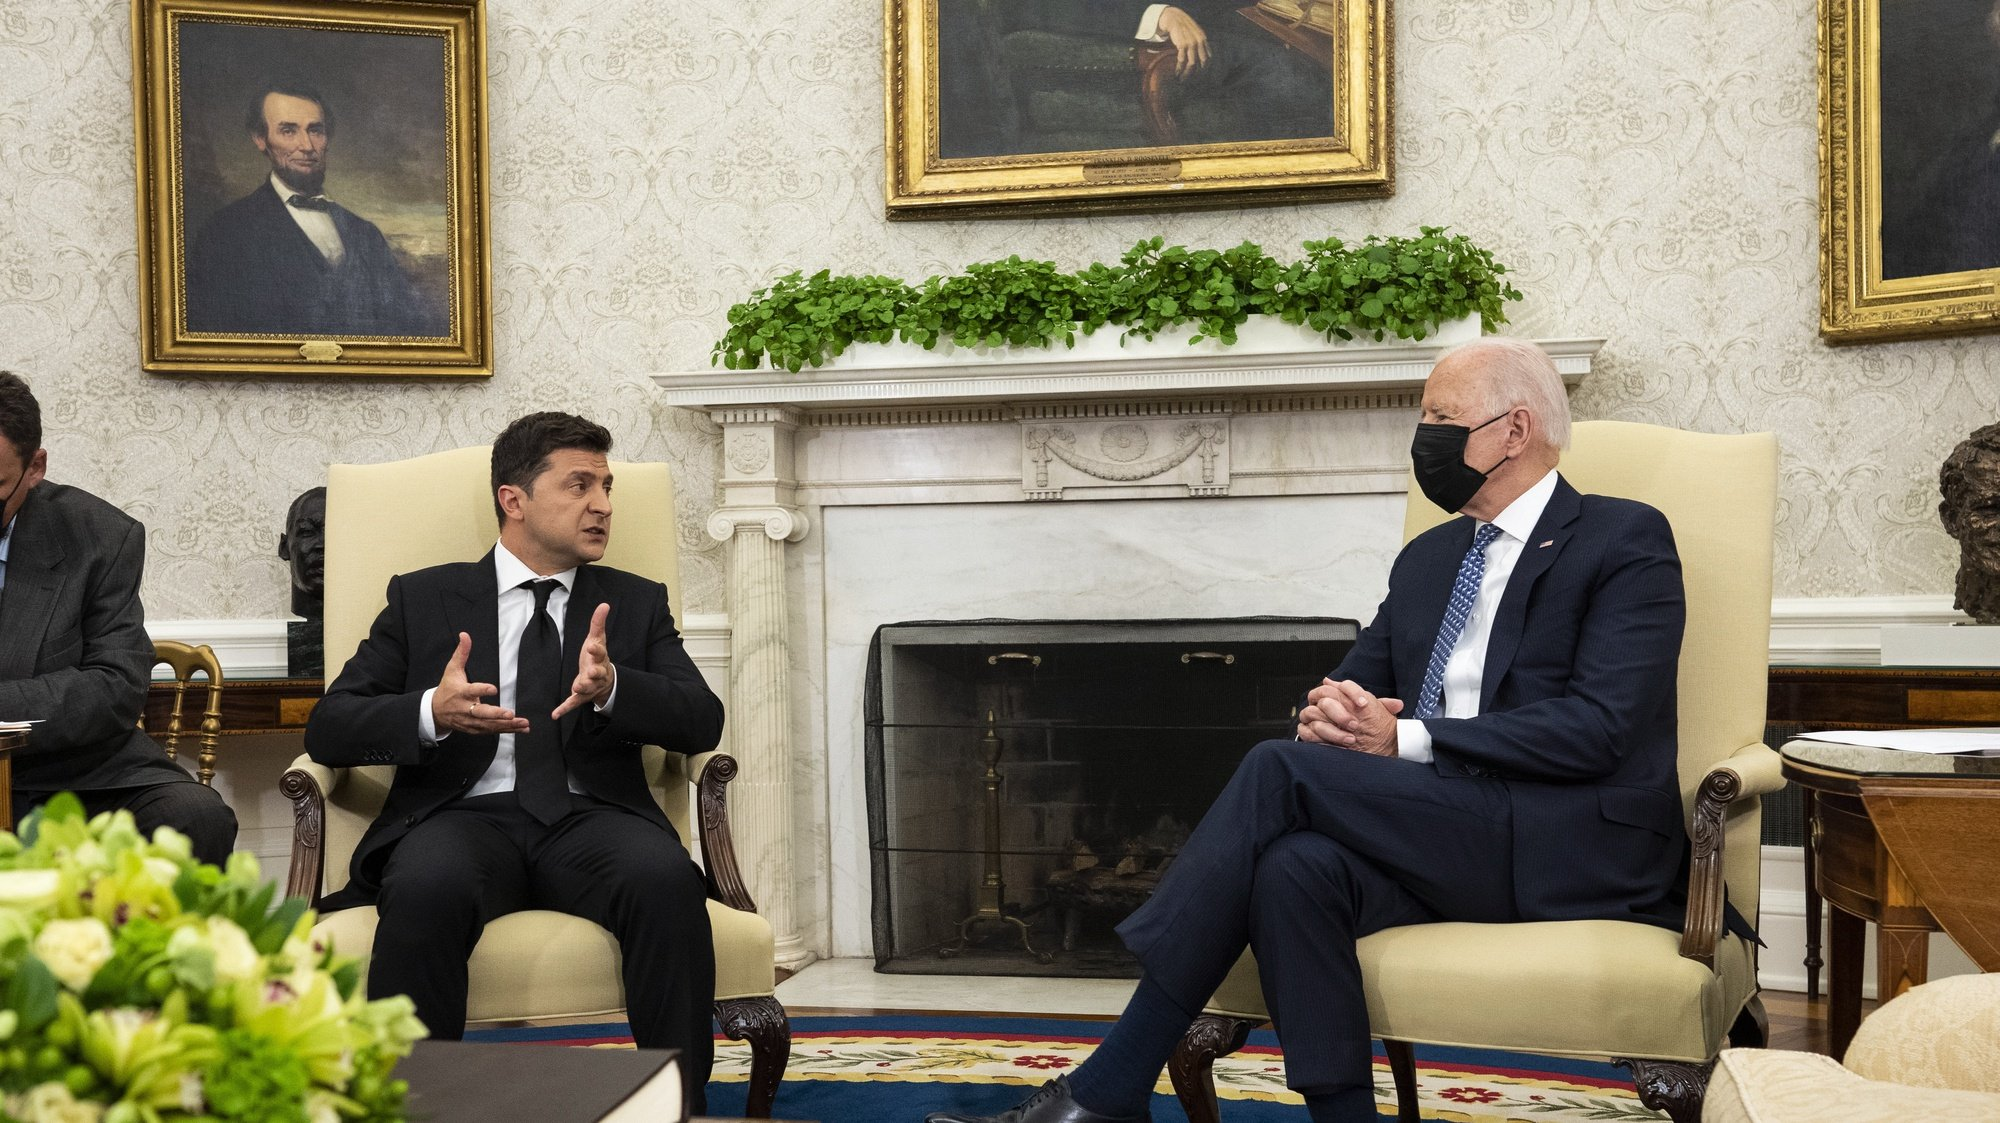 epa09441361 US President Joe Biden (R) listens as he meets with President of Ukraine Volodymyr Zelenskyy (L) in the Oval Office, in the White House, Washington, DC, USA, 01 September 2021.  EPA/Doug Mills / POOL